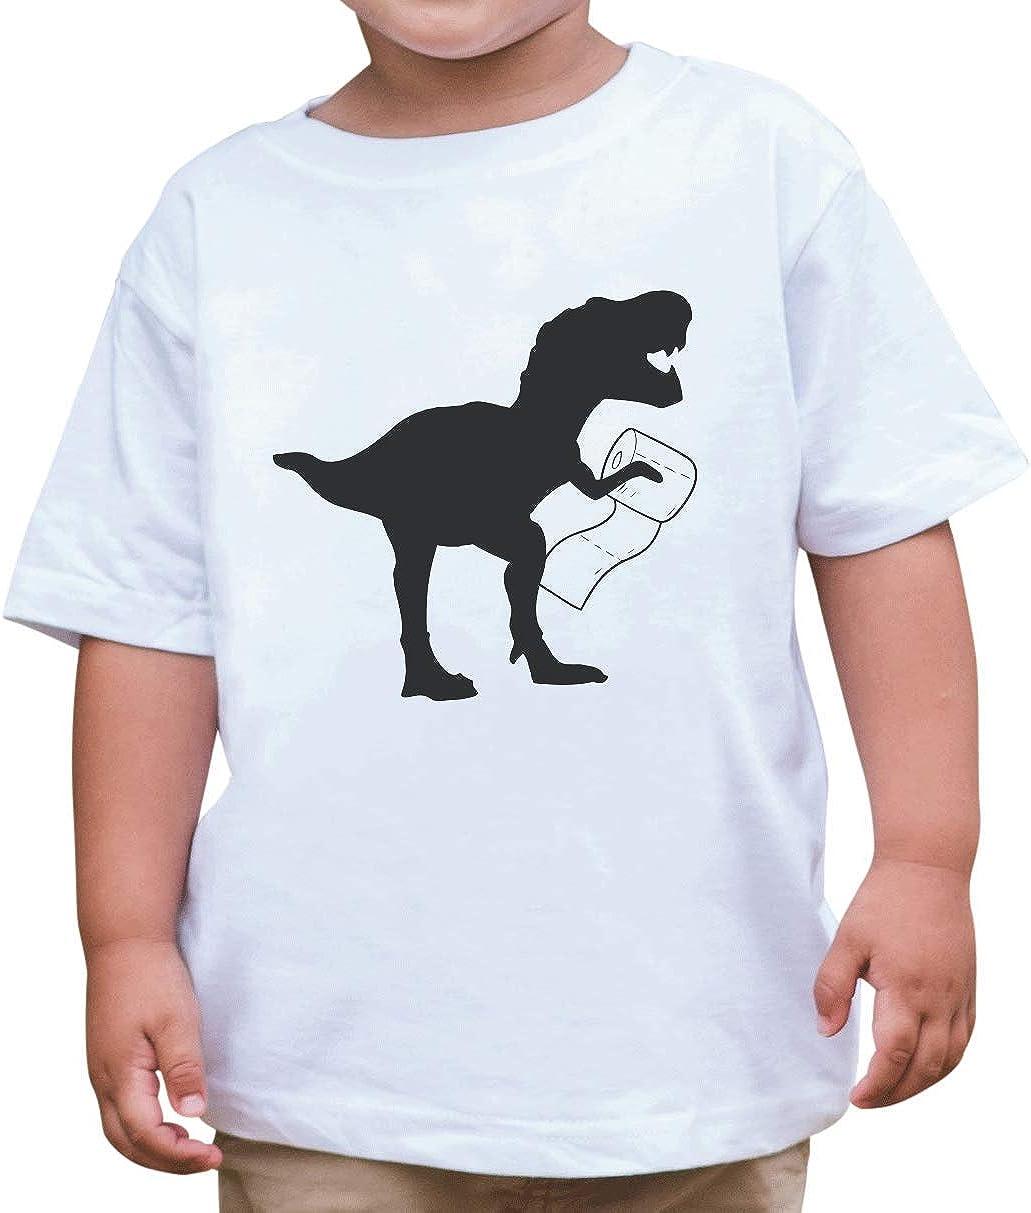 7 ate 9 Apparel Kids Dinosaur Toilet Paper Quarantine Outfit